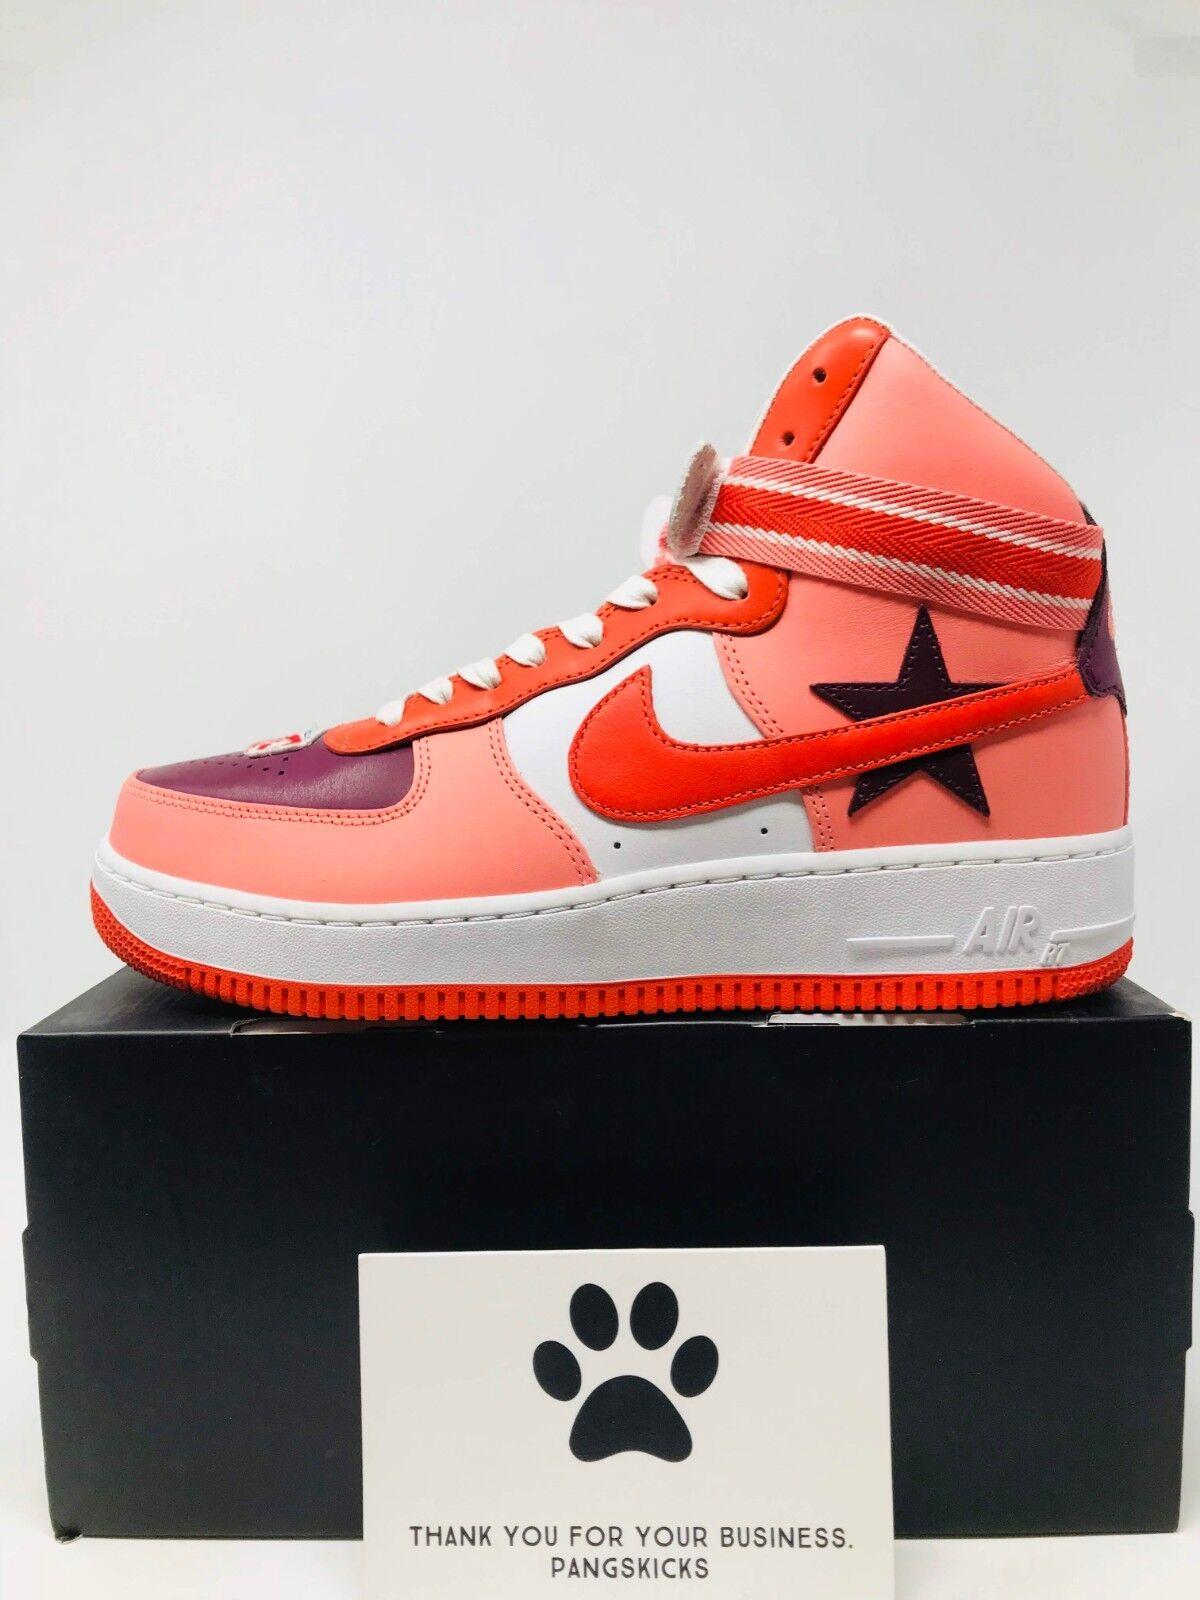 Nike air force 1 hohe nikelab x rt riccardo riccardo riccardo tisci sunblush aq3366-601 größe 9. 663b8f